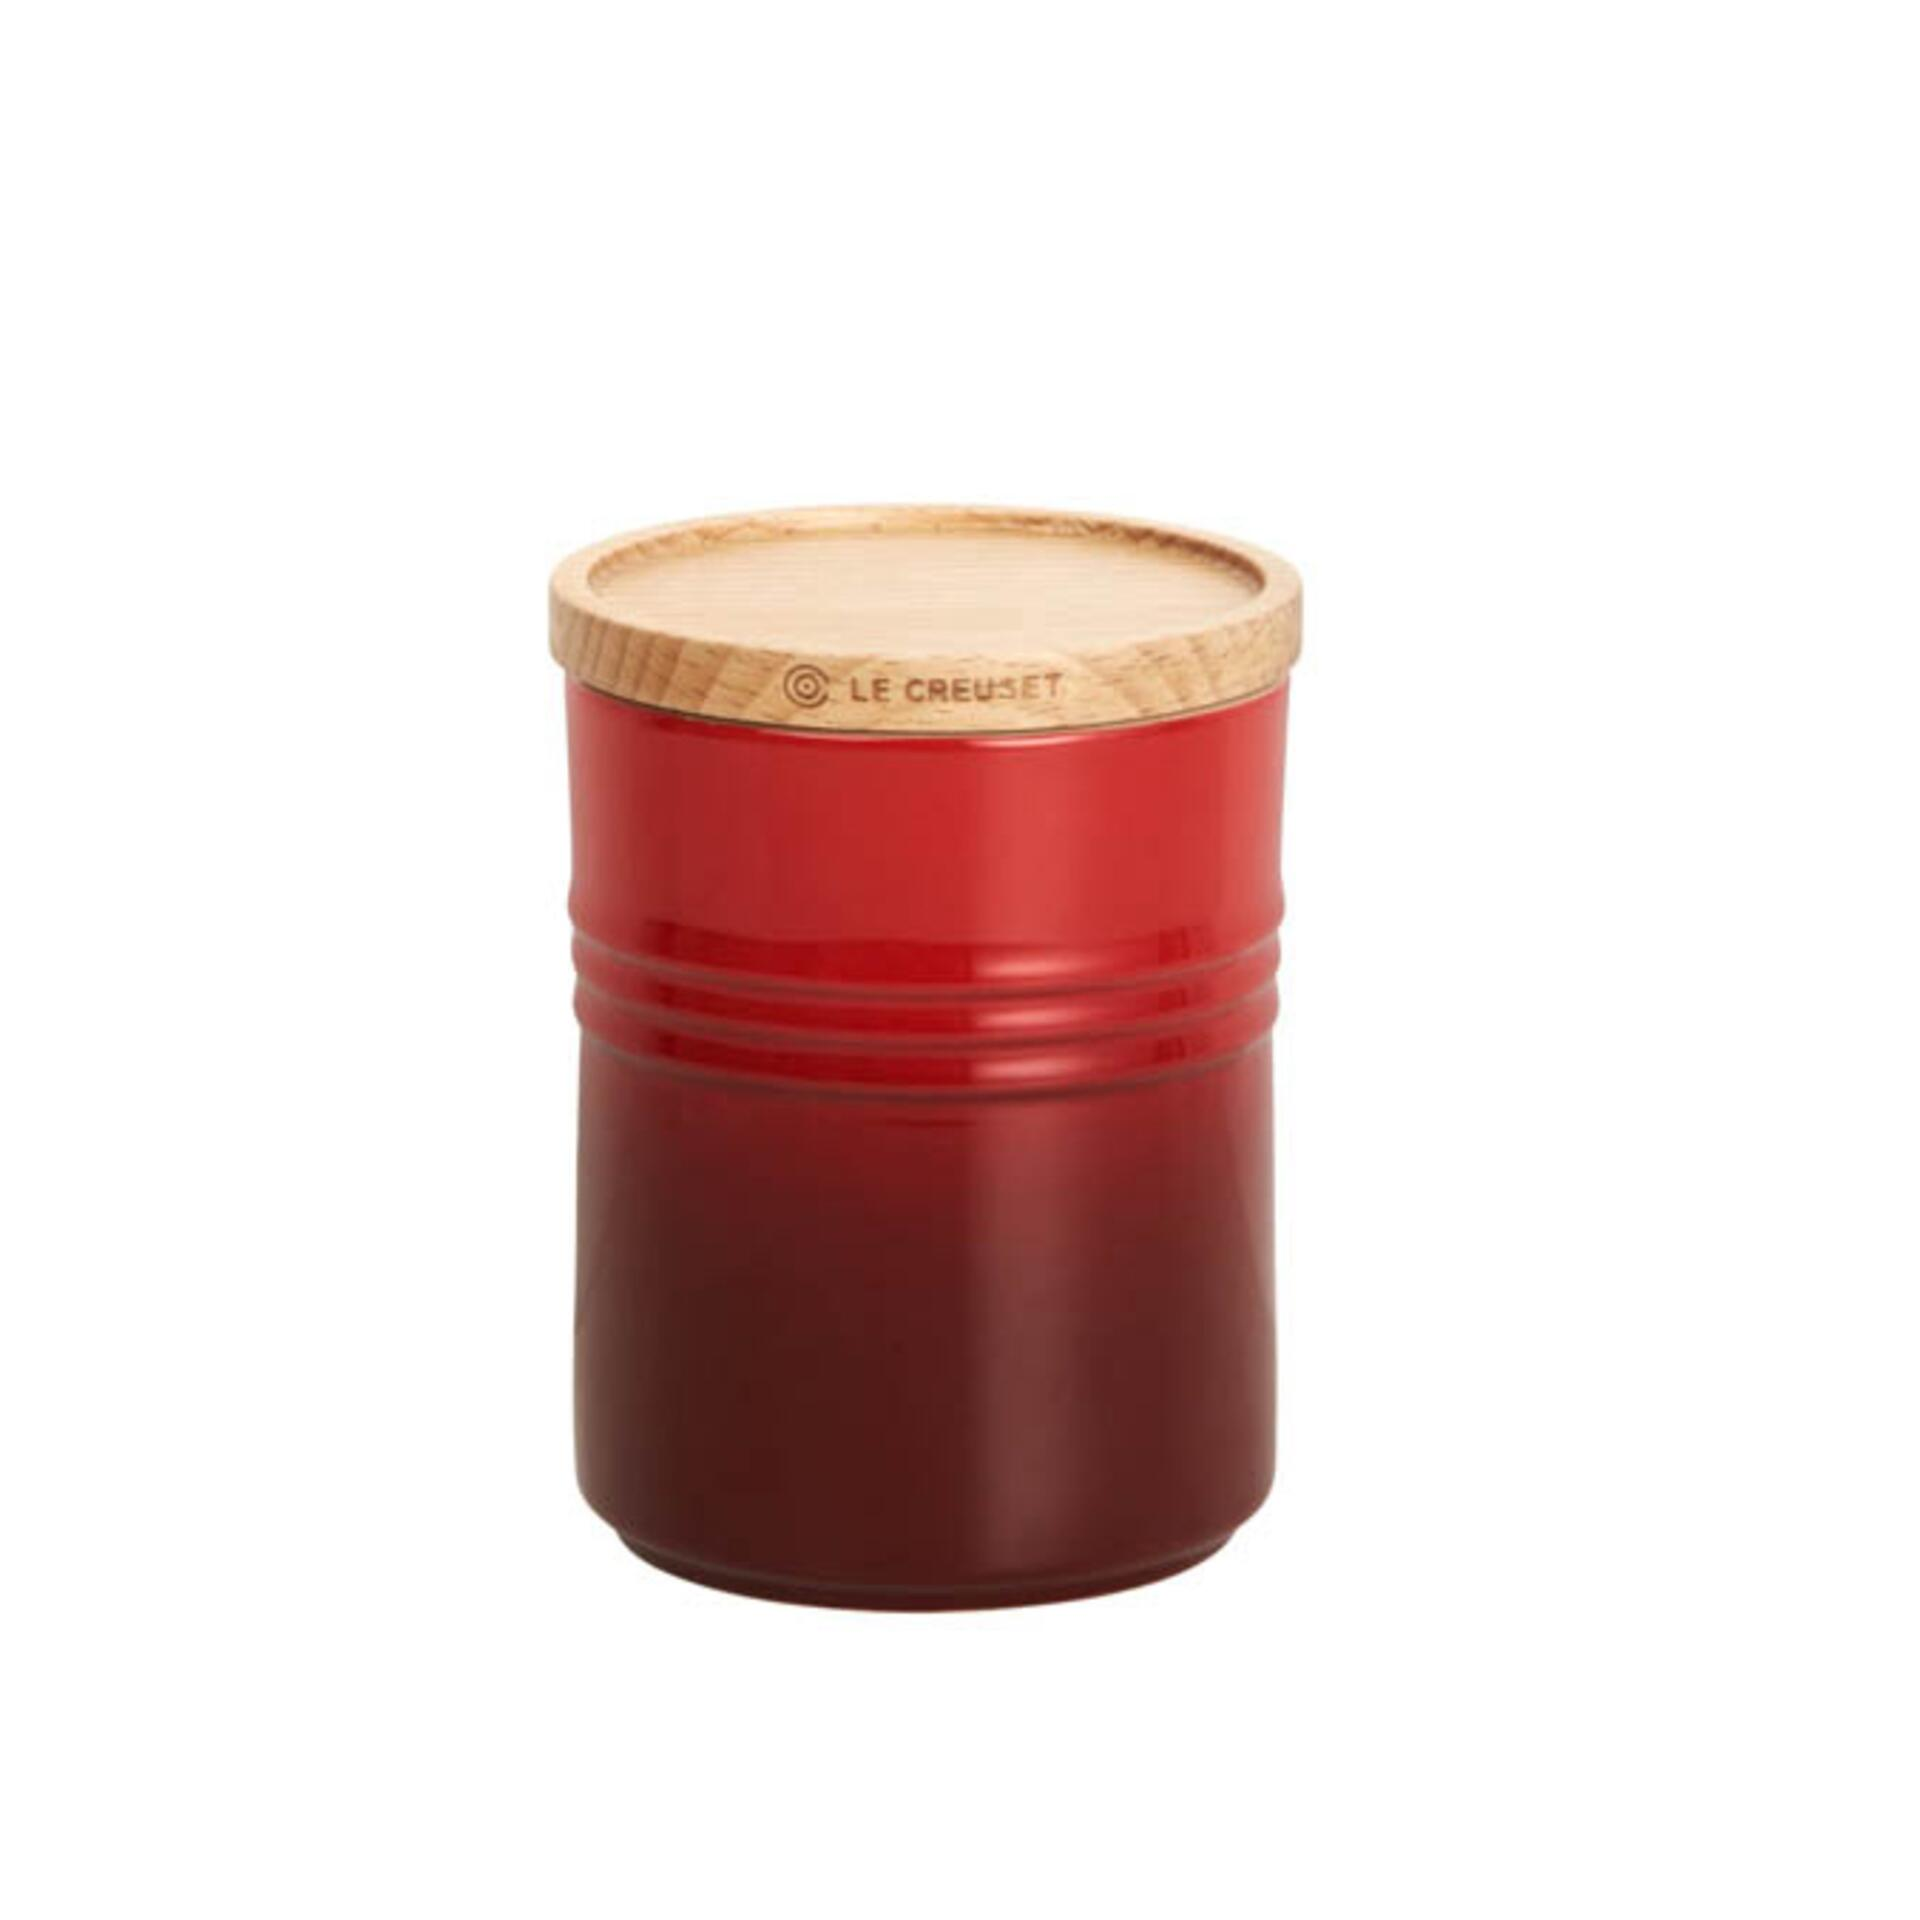 Le Creuset Vorratsdose 540 ml Kirschrot